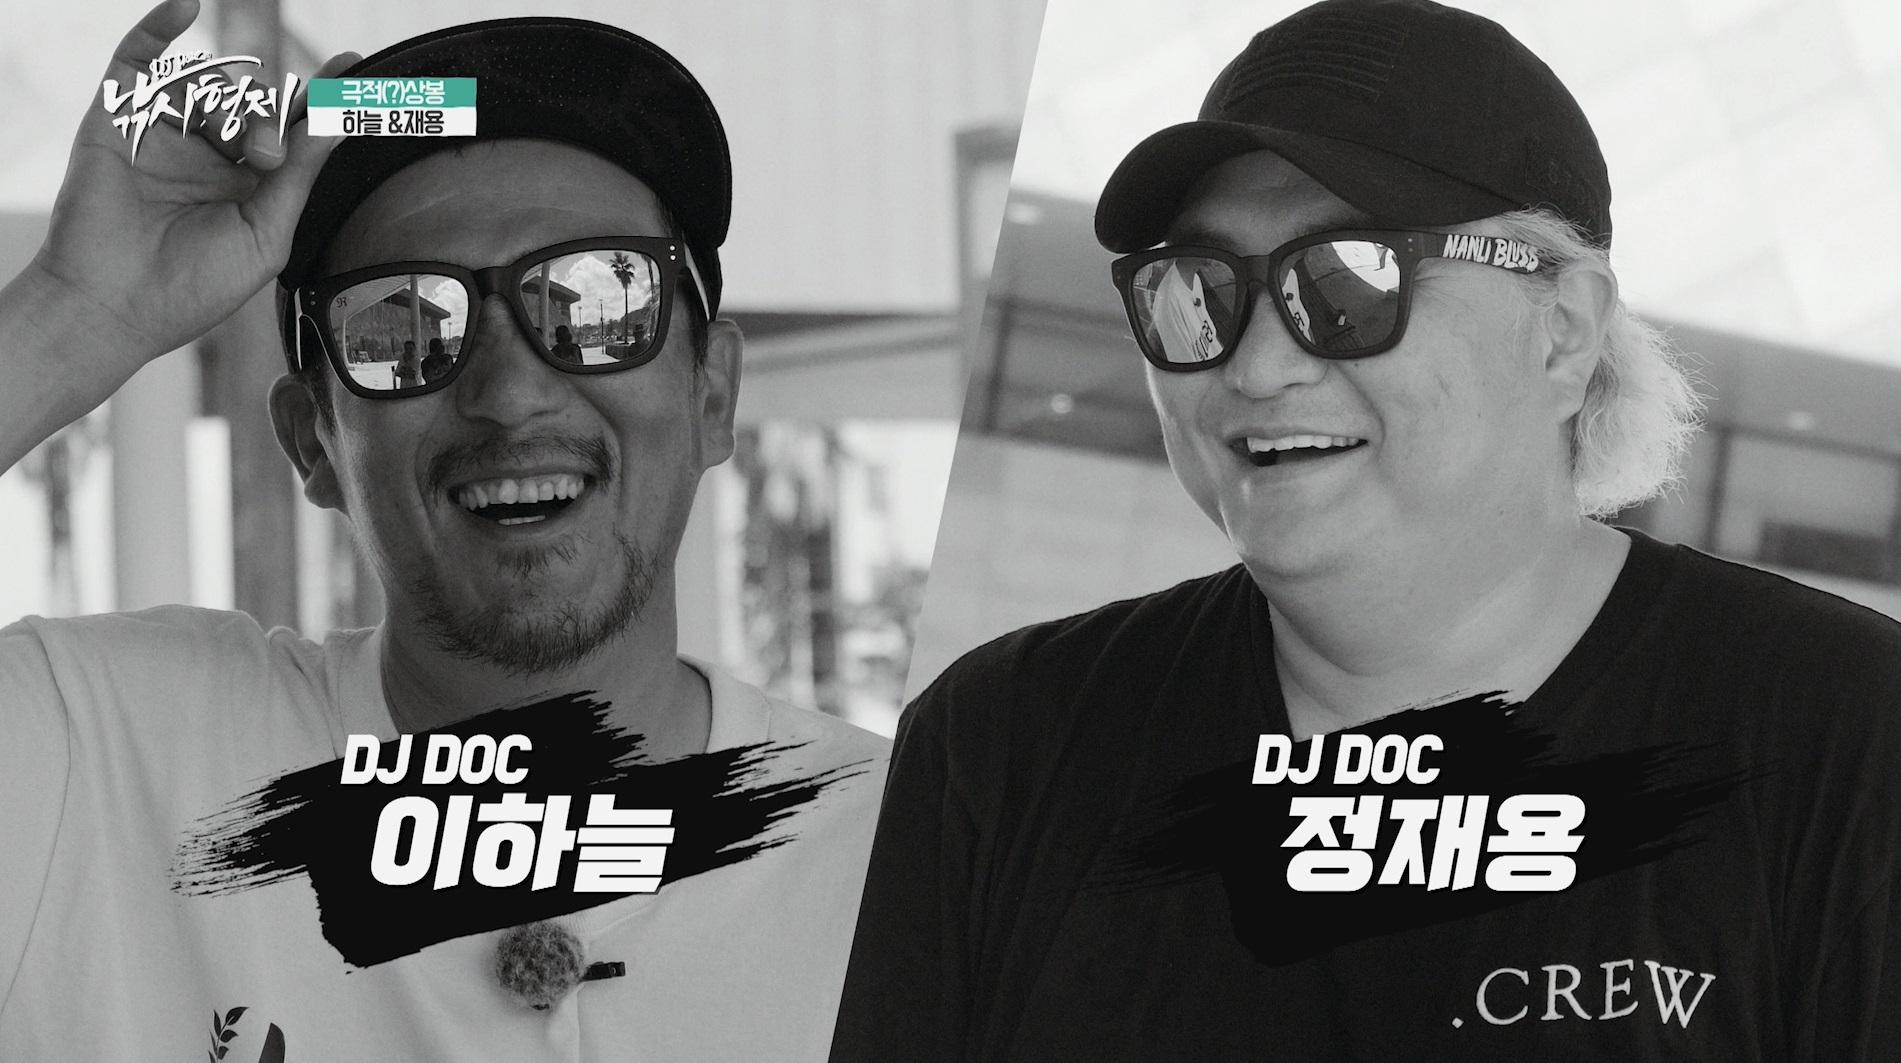 'DJ DOC의 낚시형제' 두 남자, 이하늘·정재용의 낚시 스타일 전격 분석